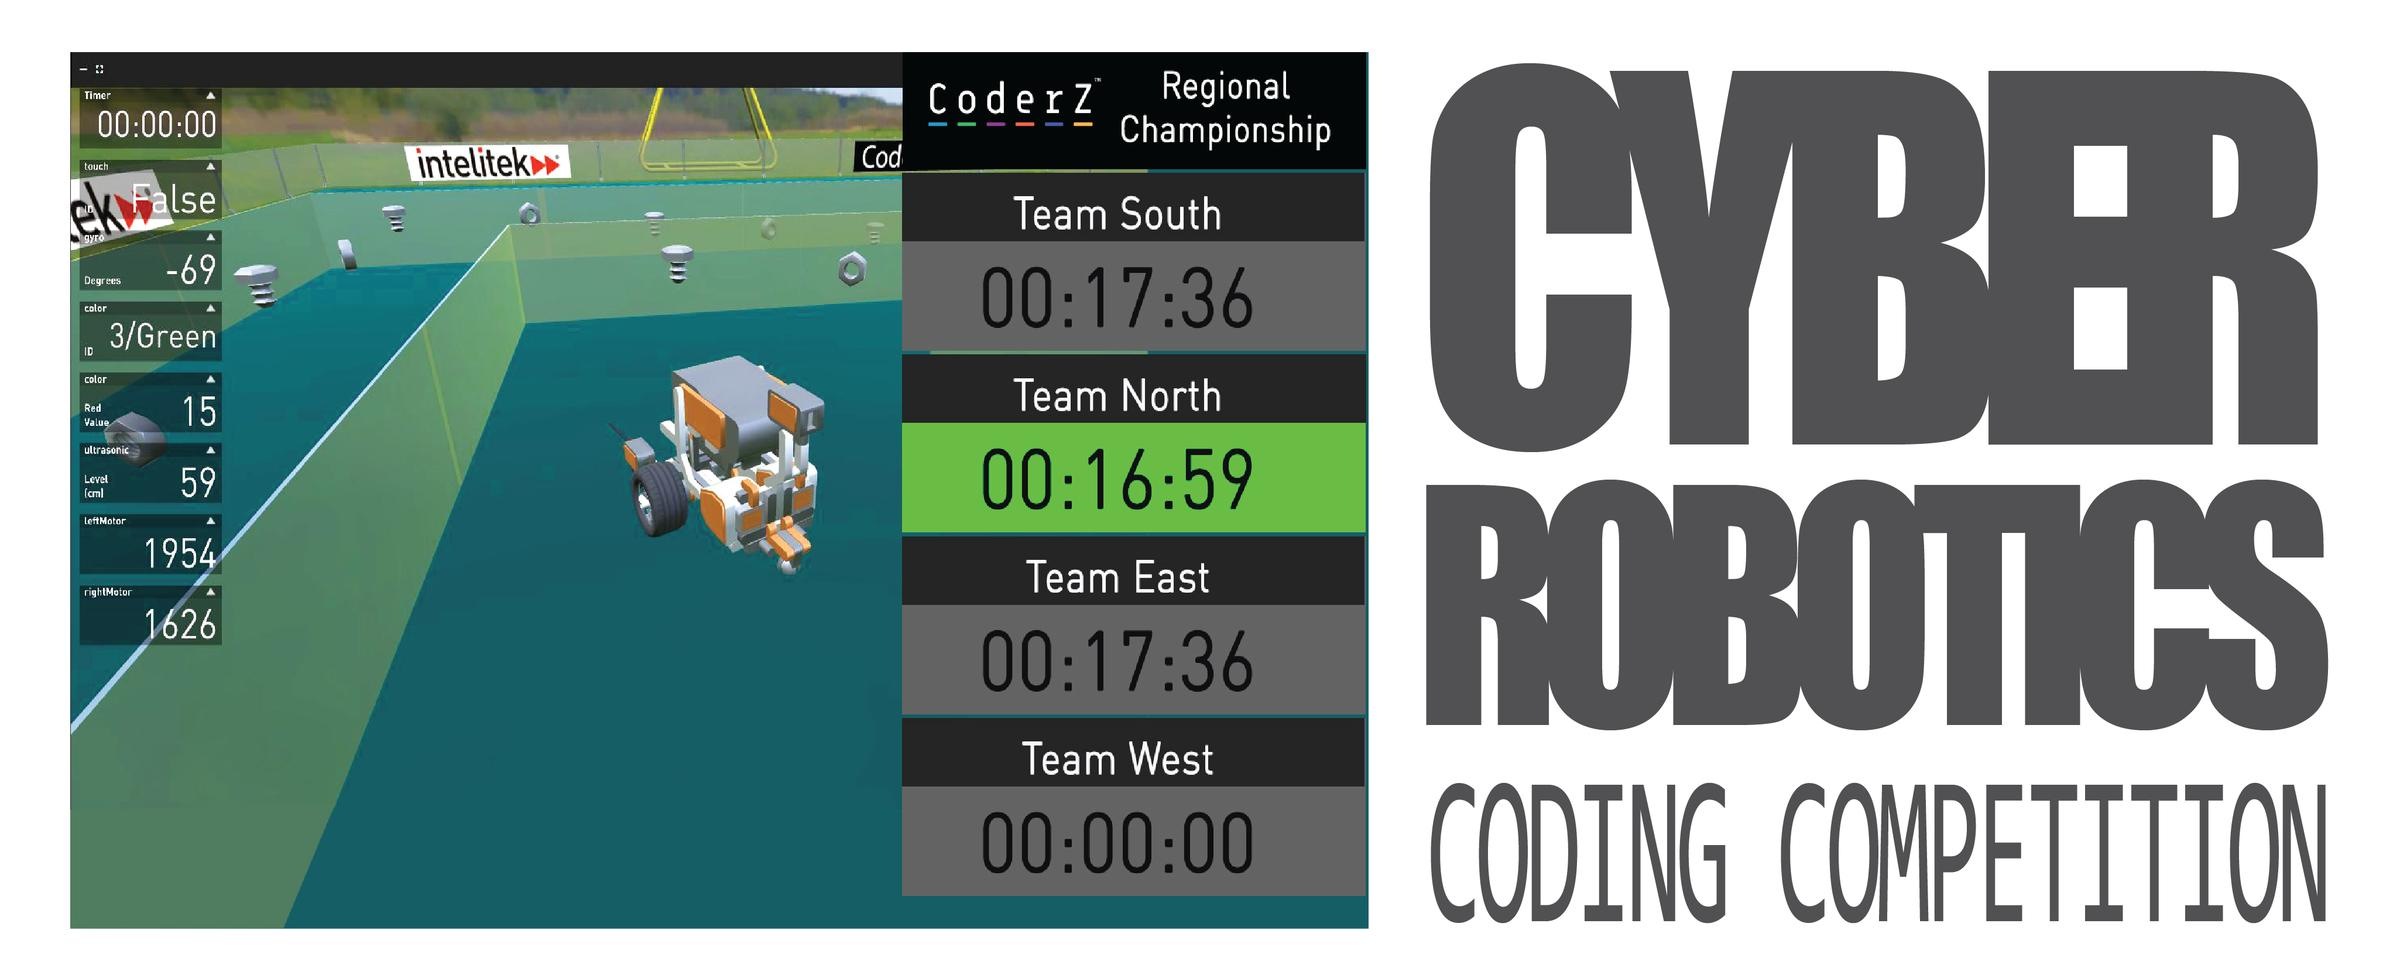 W Va Middle Schoolers To Participate In New Cyber Robotics Coding